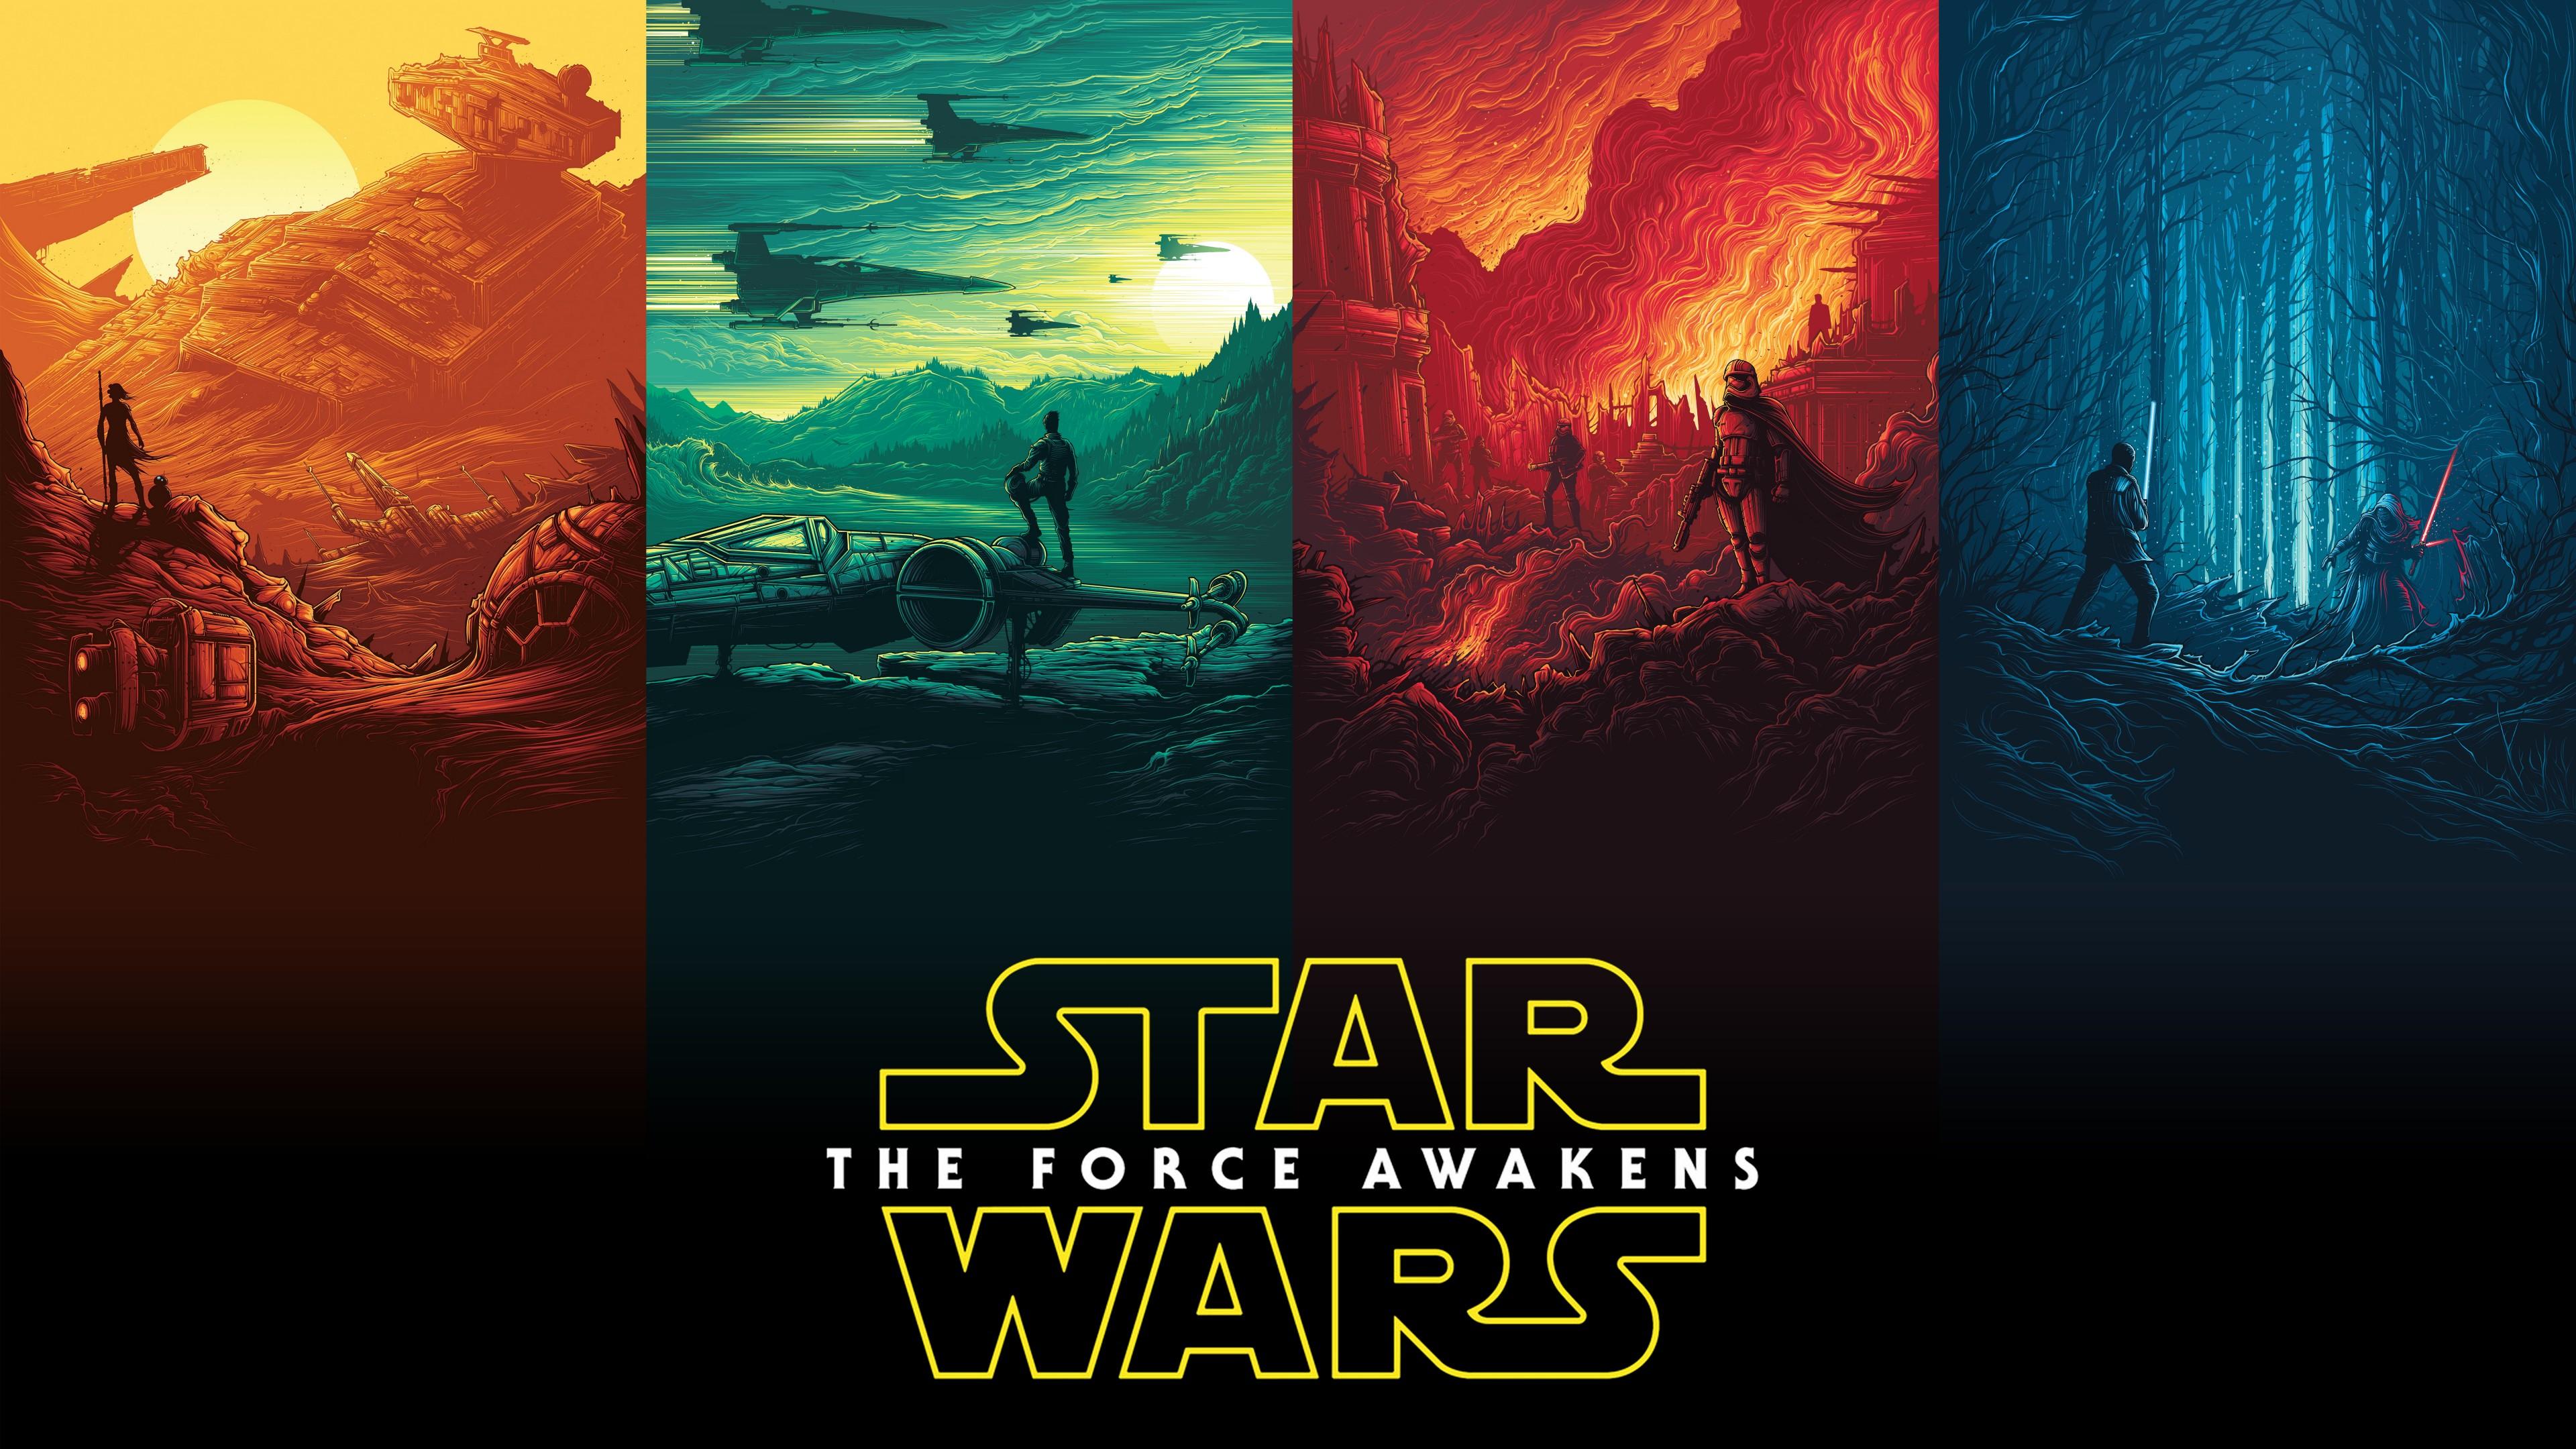 The Amazing Spider Man Wallpaper For Iphone Rey Finn Kylo Ren Han Solo Luke Skywalker Star Wars